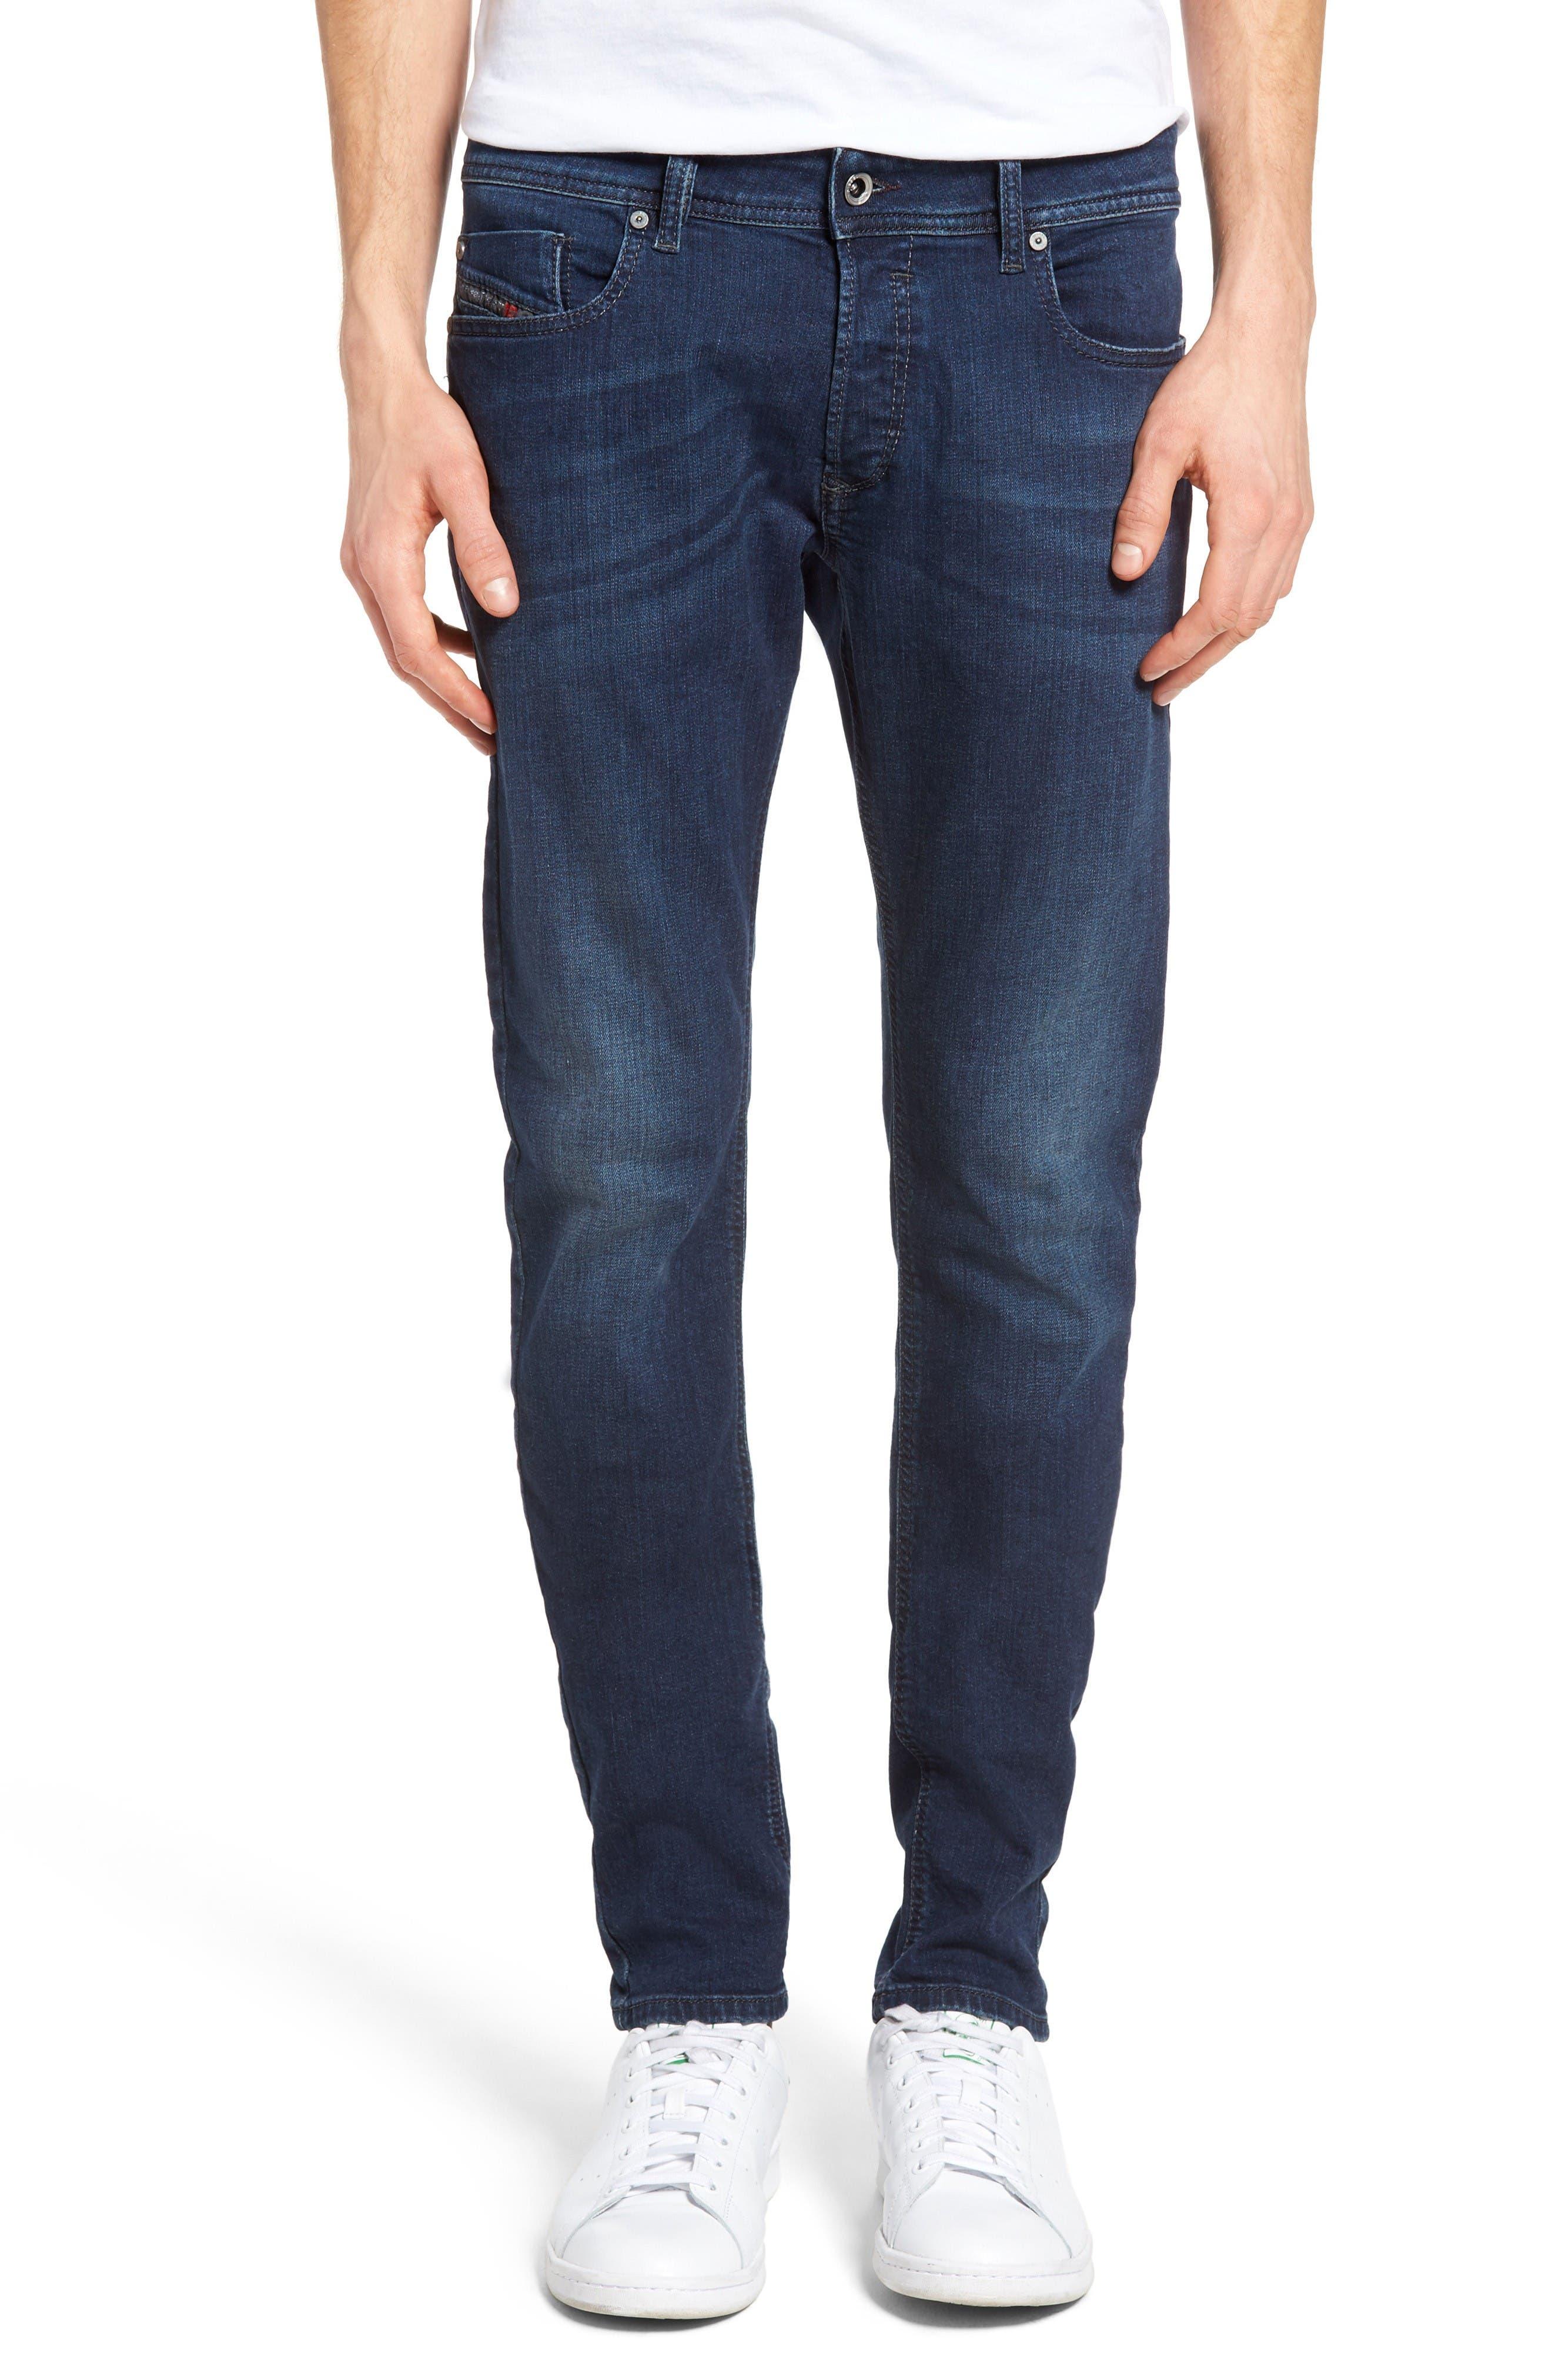 Sleenker Skinny Fit Jeans,                         Main,                         color, 0854E